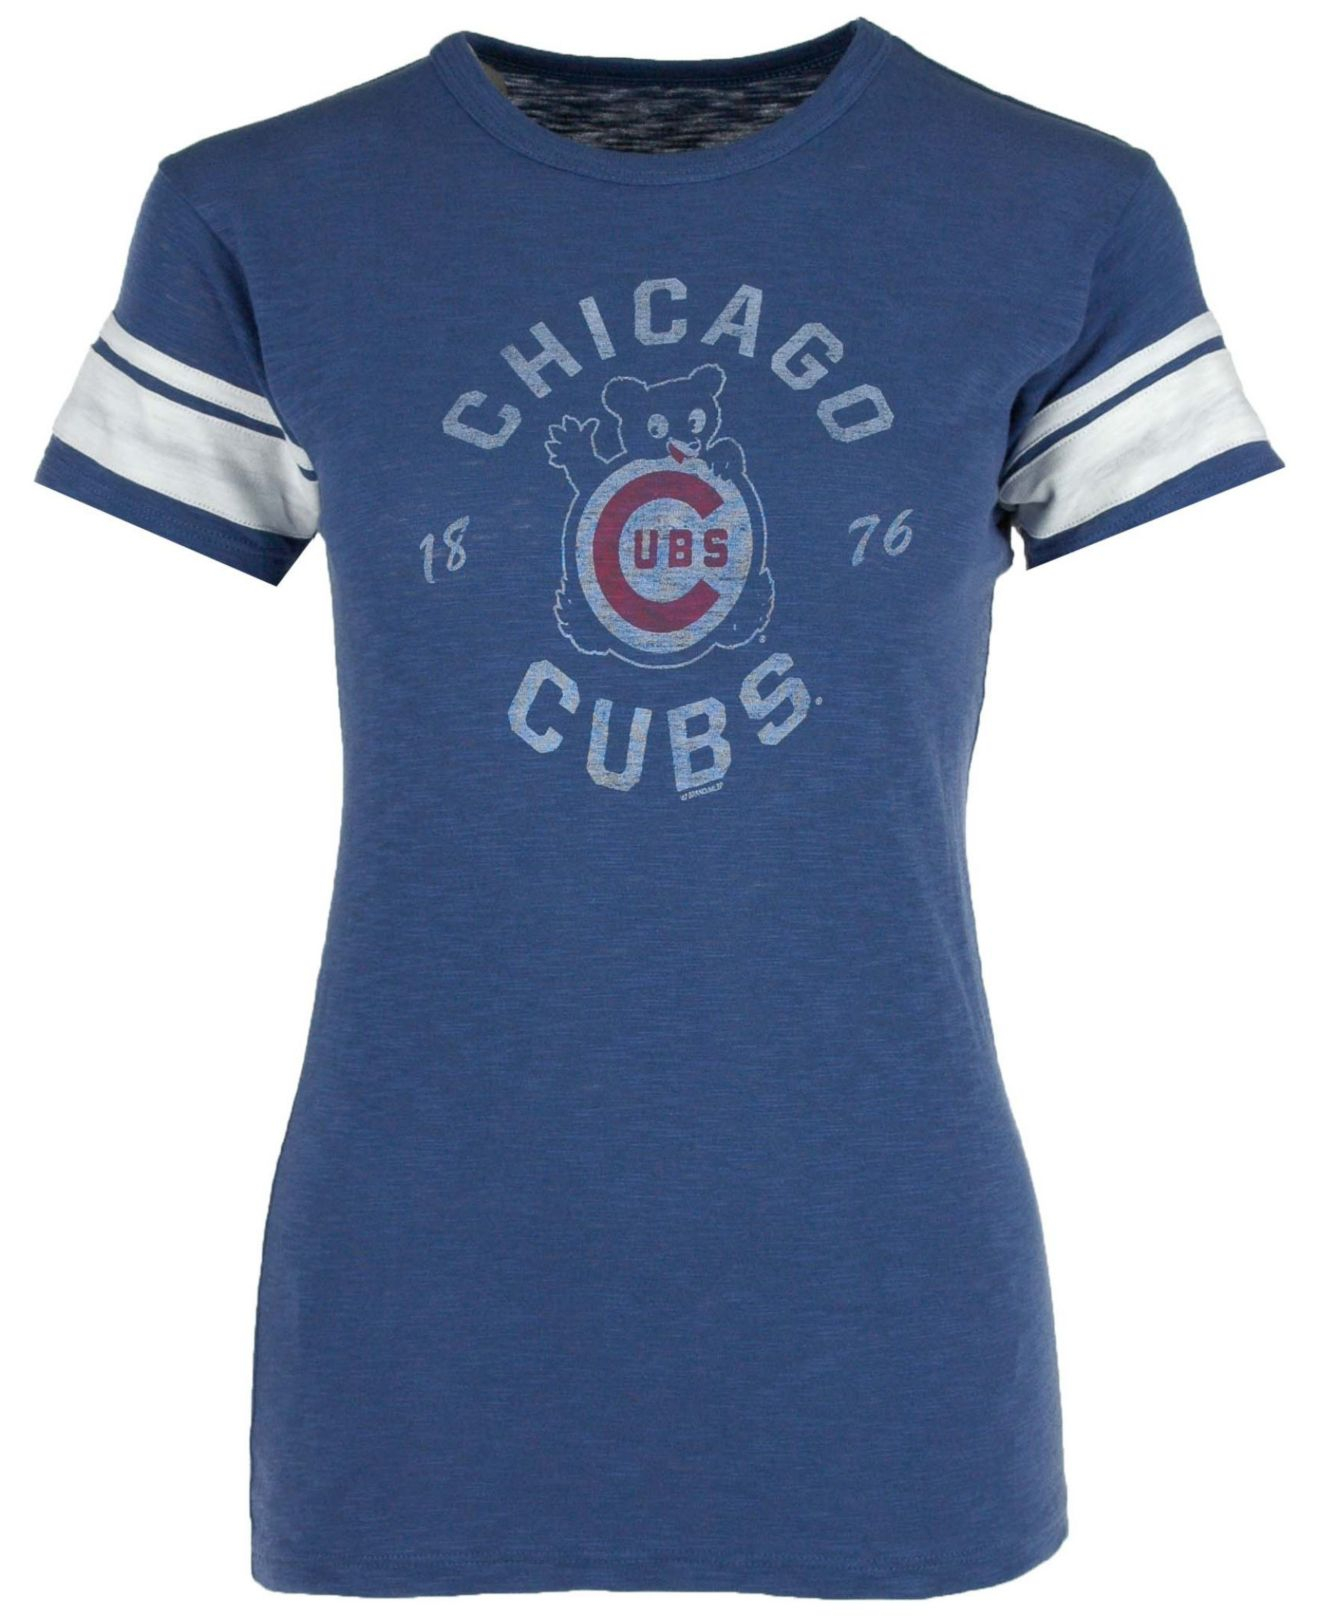 womens cubs shirts